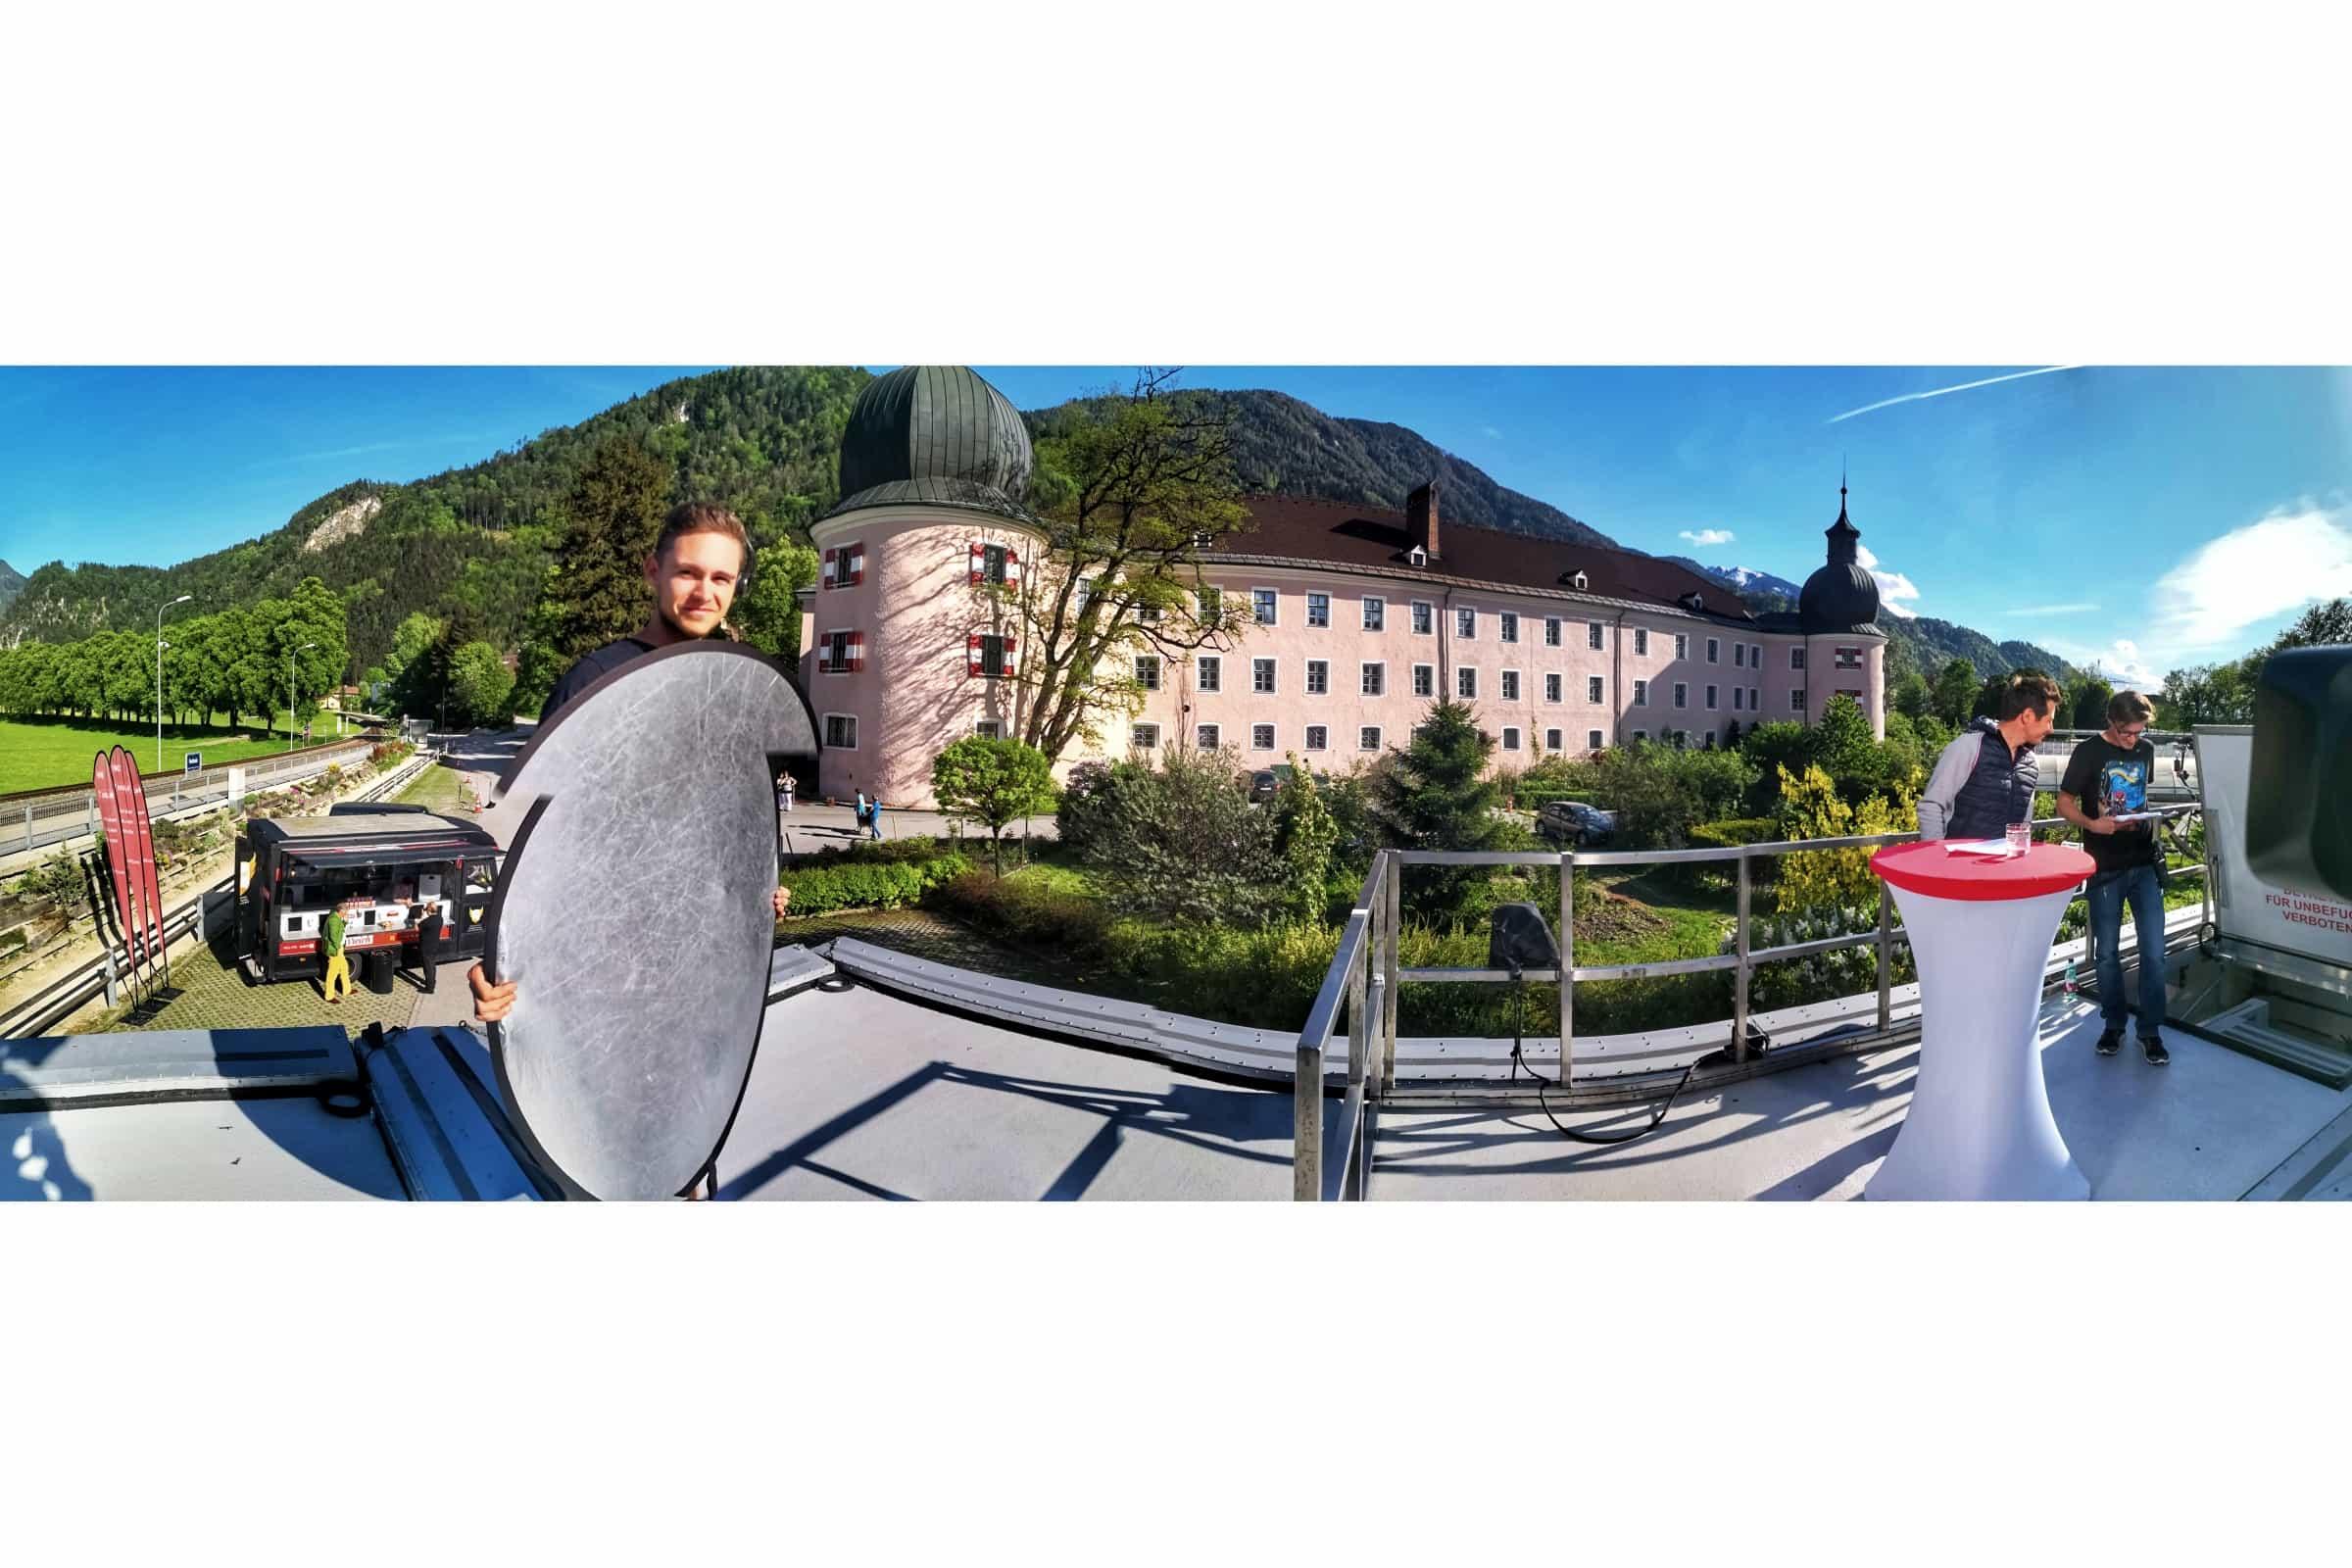 andreas felder kameramann orf unterwegs in österreich 31 30.04.2018 17 20 24 - ORF Unterwegs in Österreich - Tirol